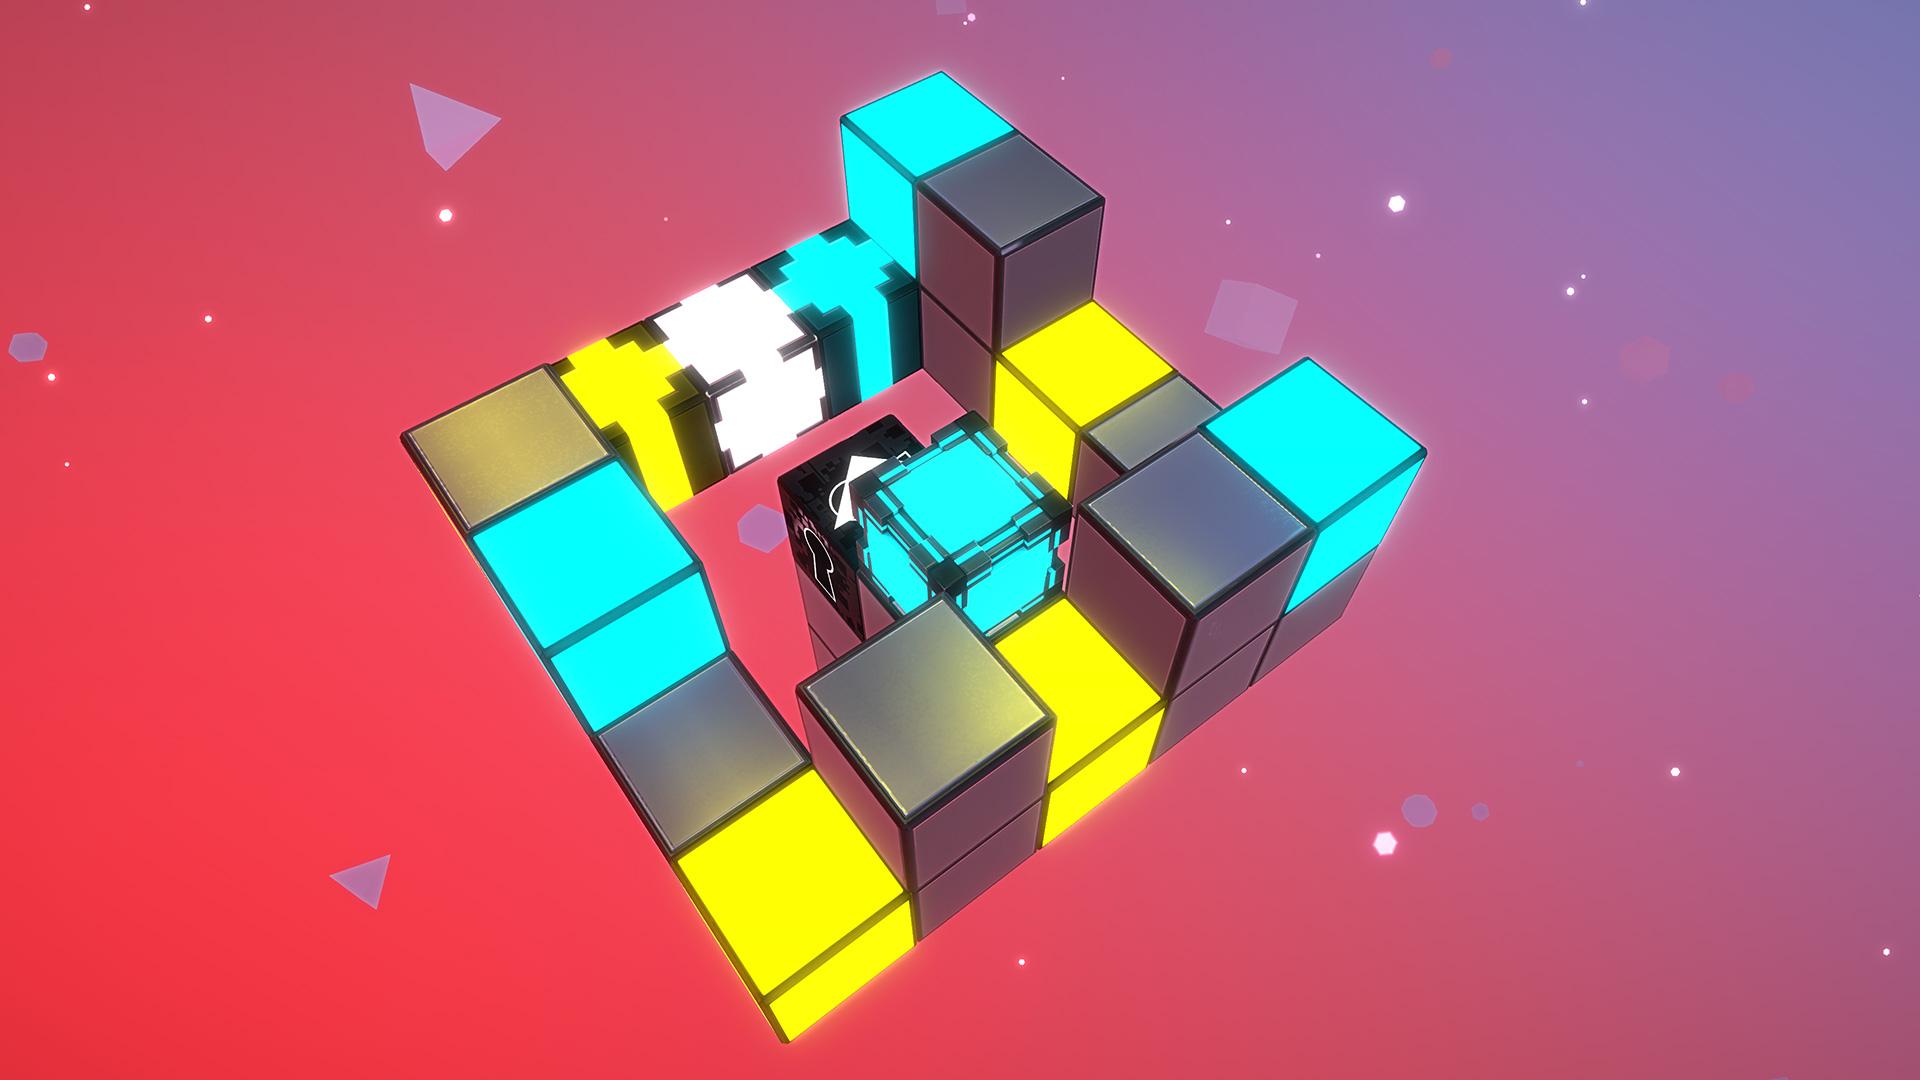 IMAGE(http://image.noelshack.com/fichiers/2016/16/1461156172-fractalbox-cubikolor-screen-04.jpg)